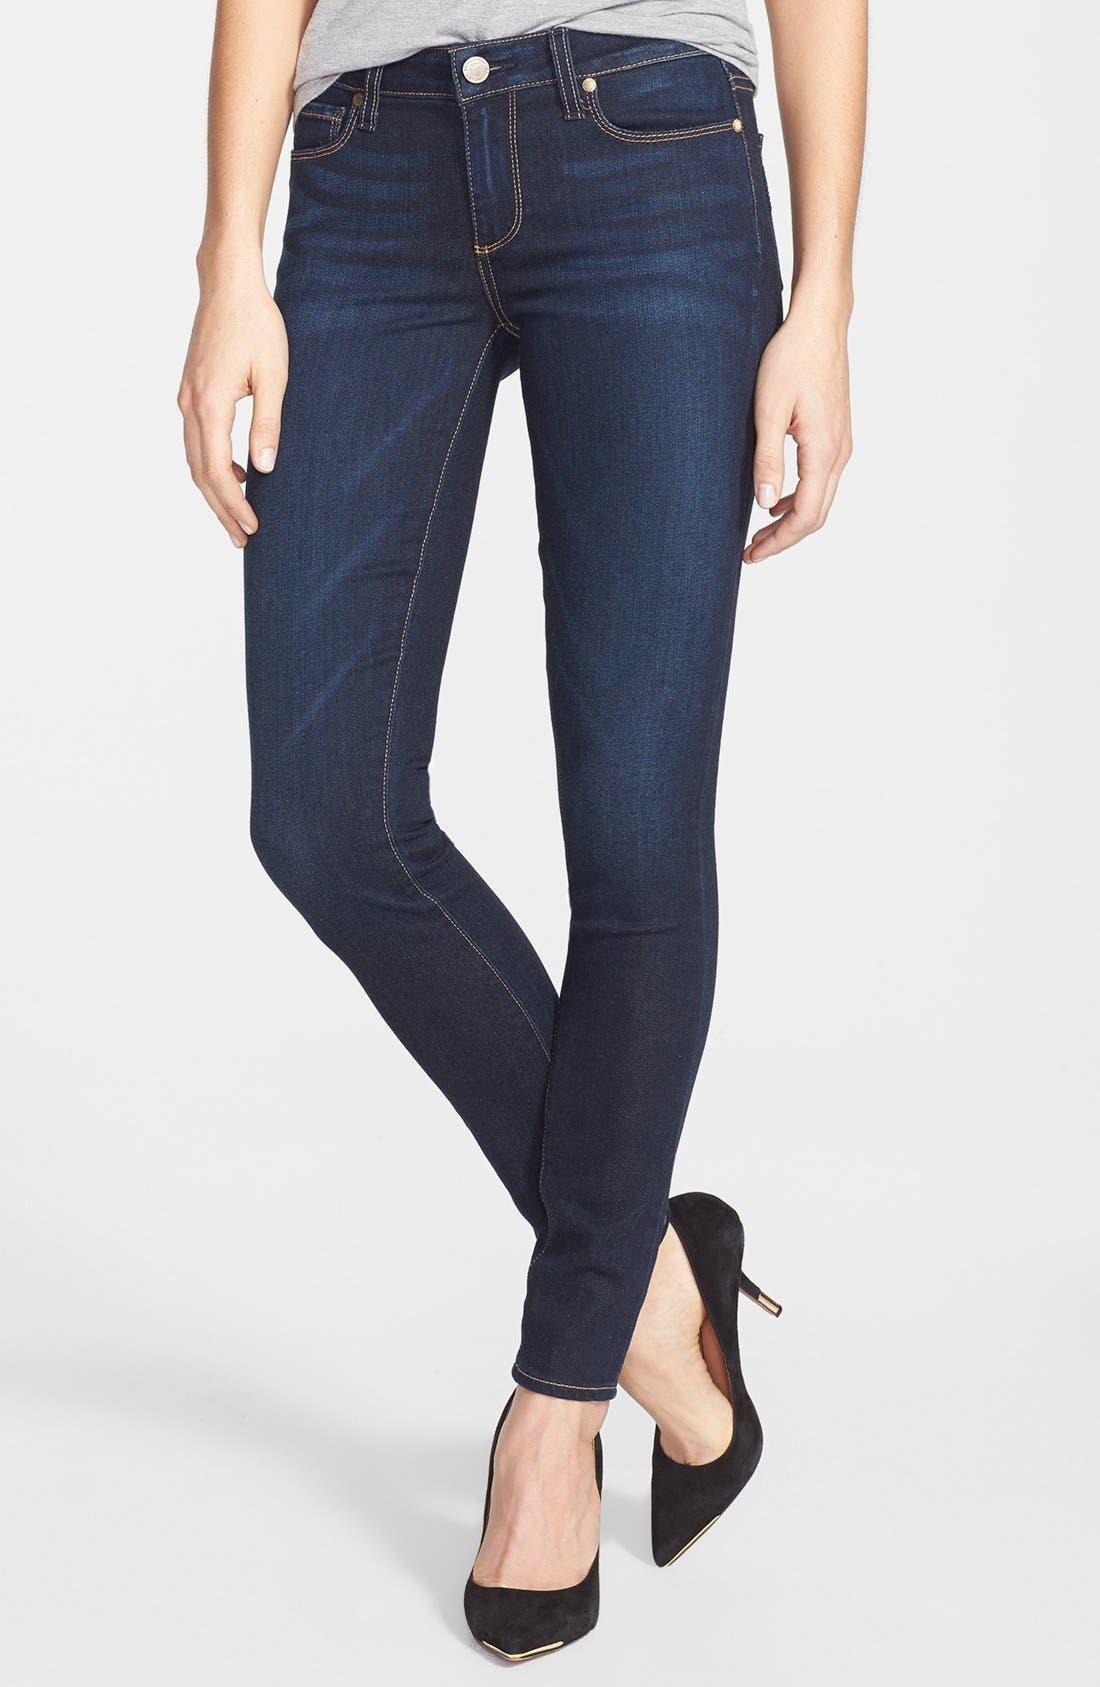 Alternate Image 1 Selected - Paige Denim 'Verdugo' Ultra Skinny Jeans (Surface)